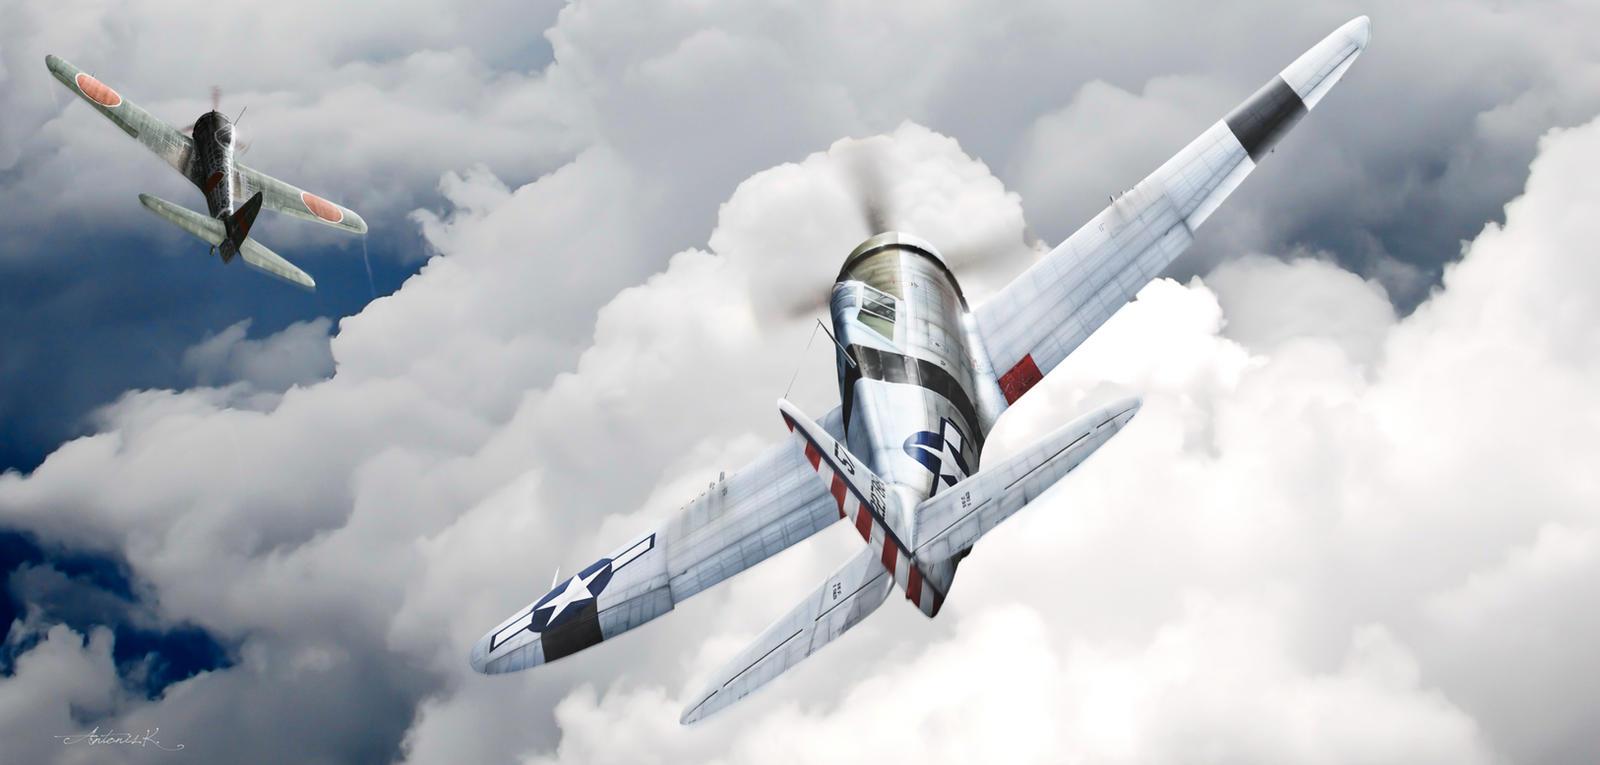 'Pacific Thunder'-Major W.Dunham by rOEN911